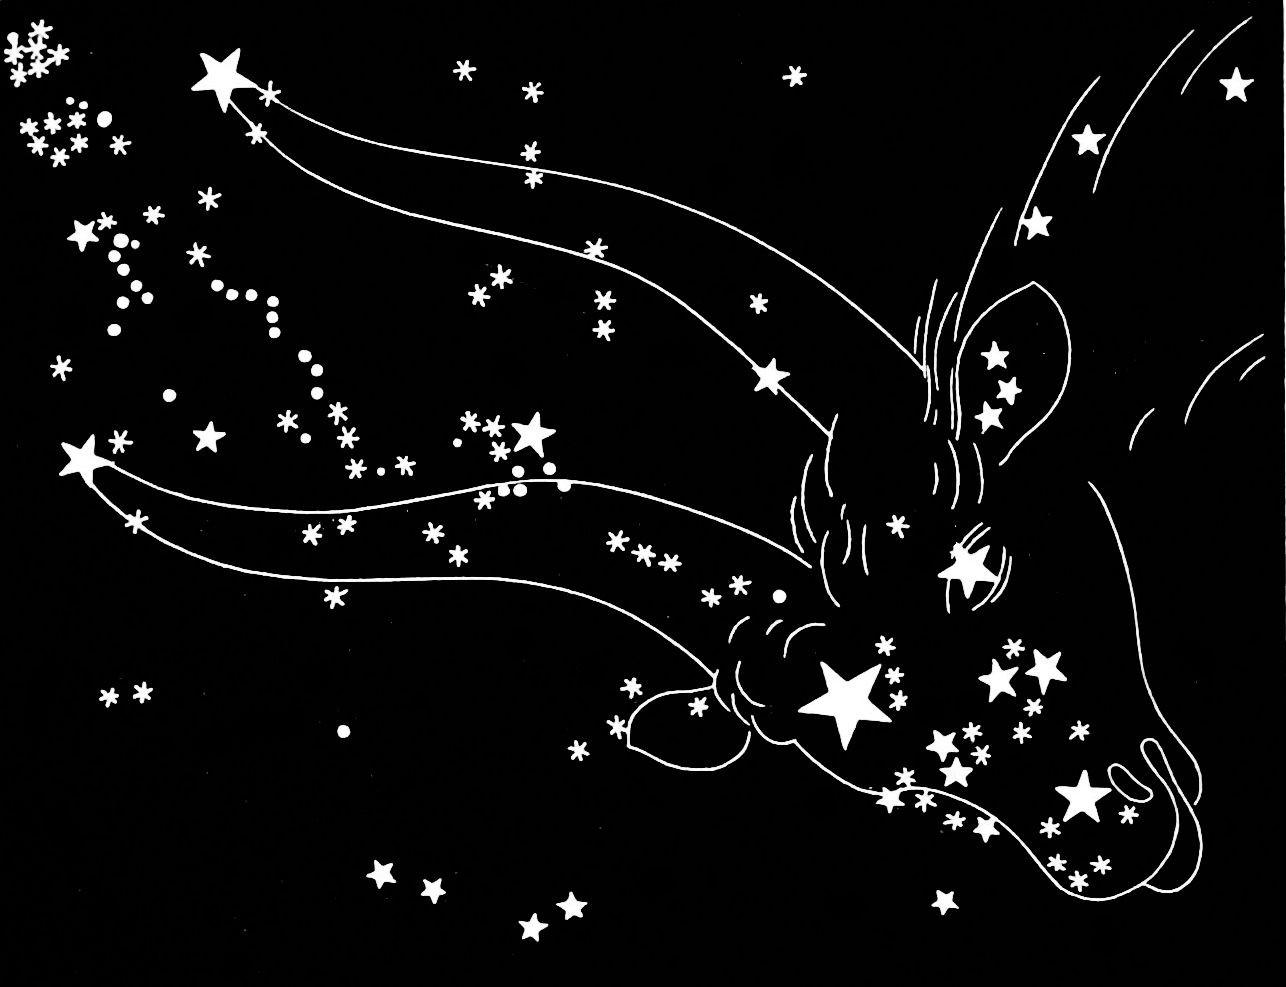 freewill astrology taurus